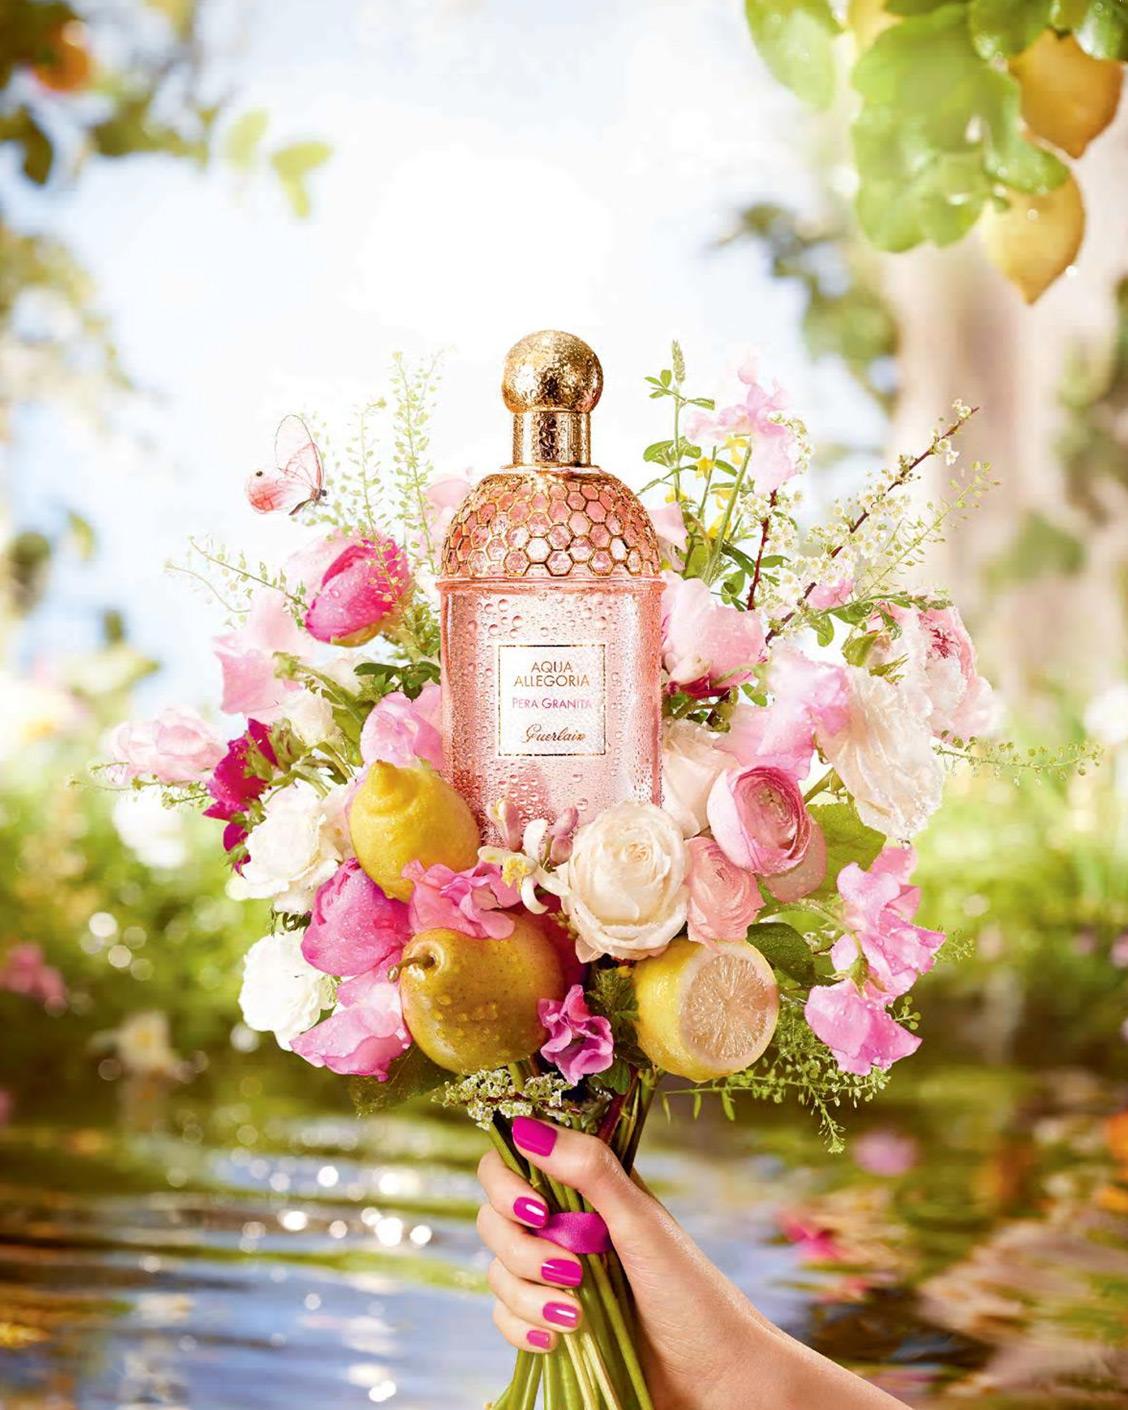 Le parfum the perfume